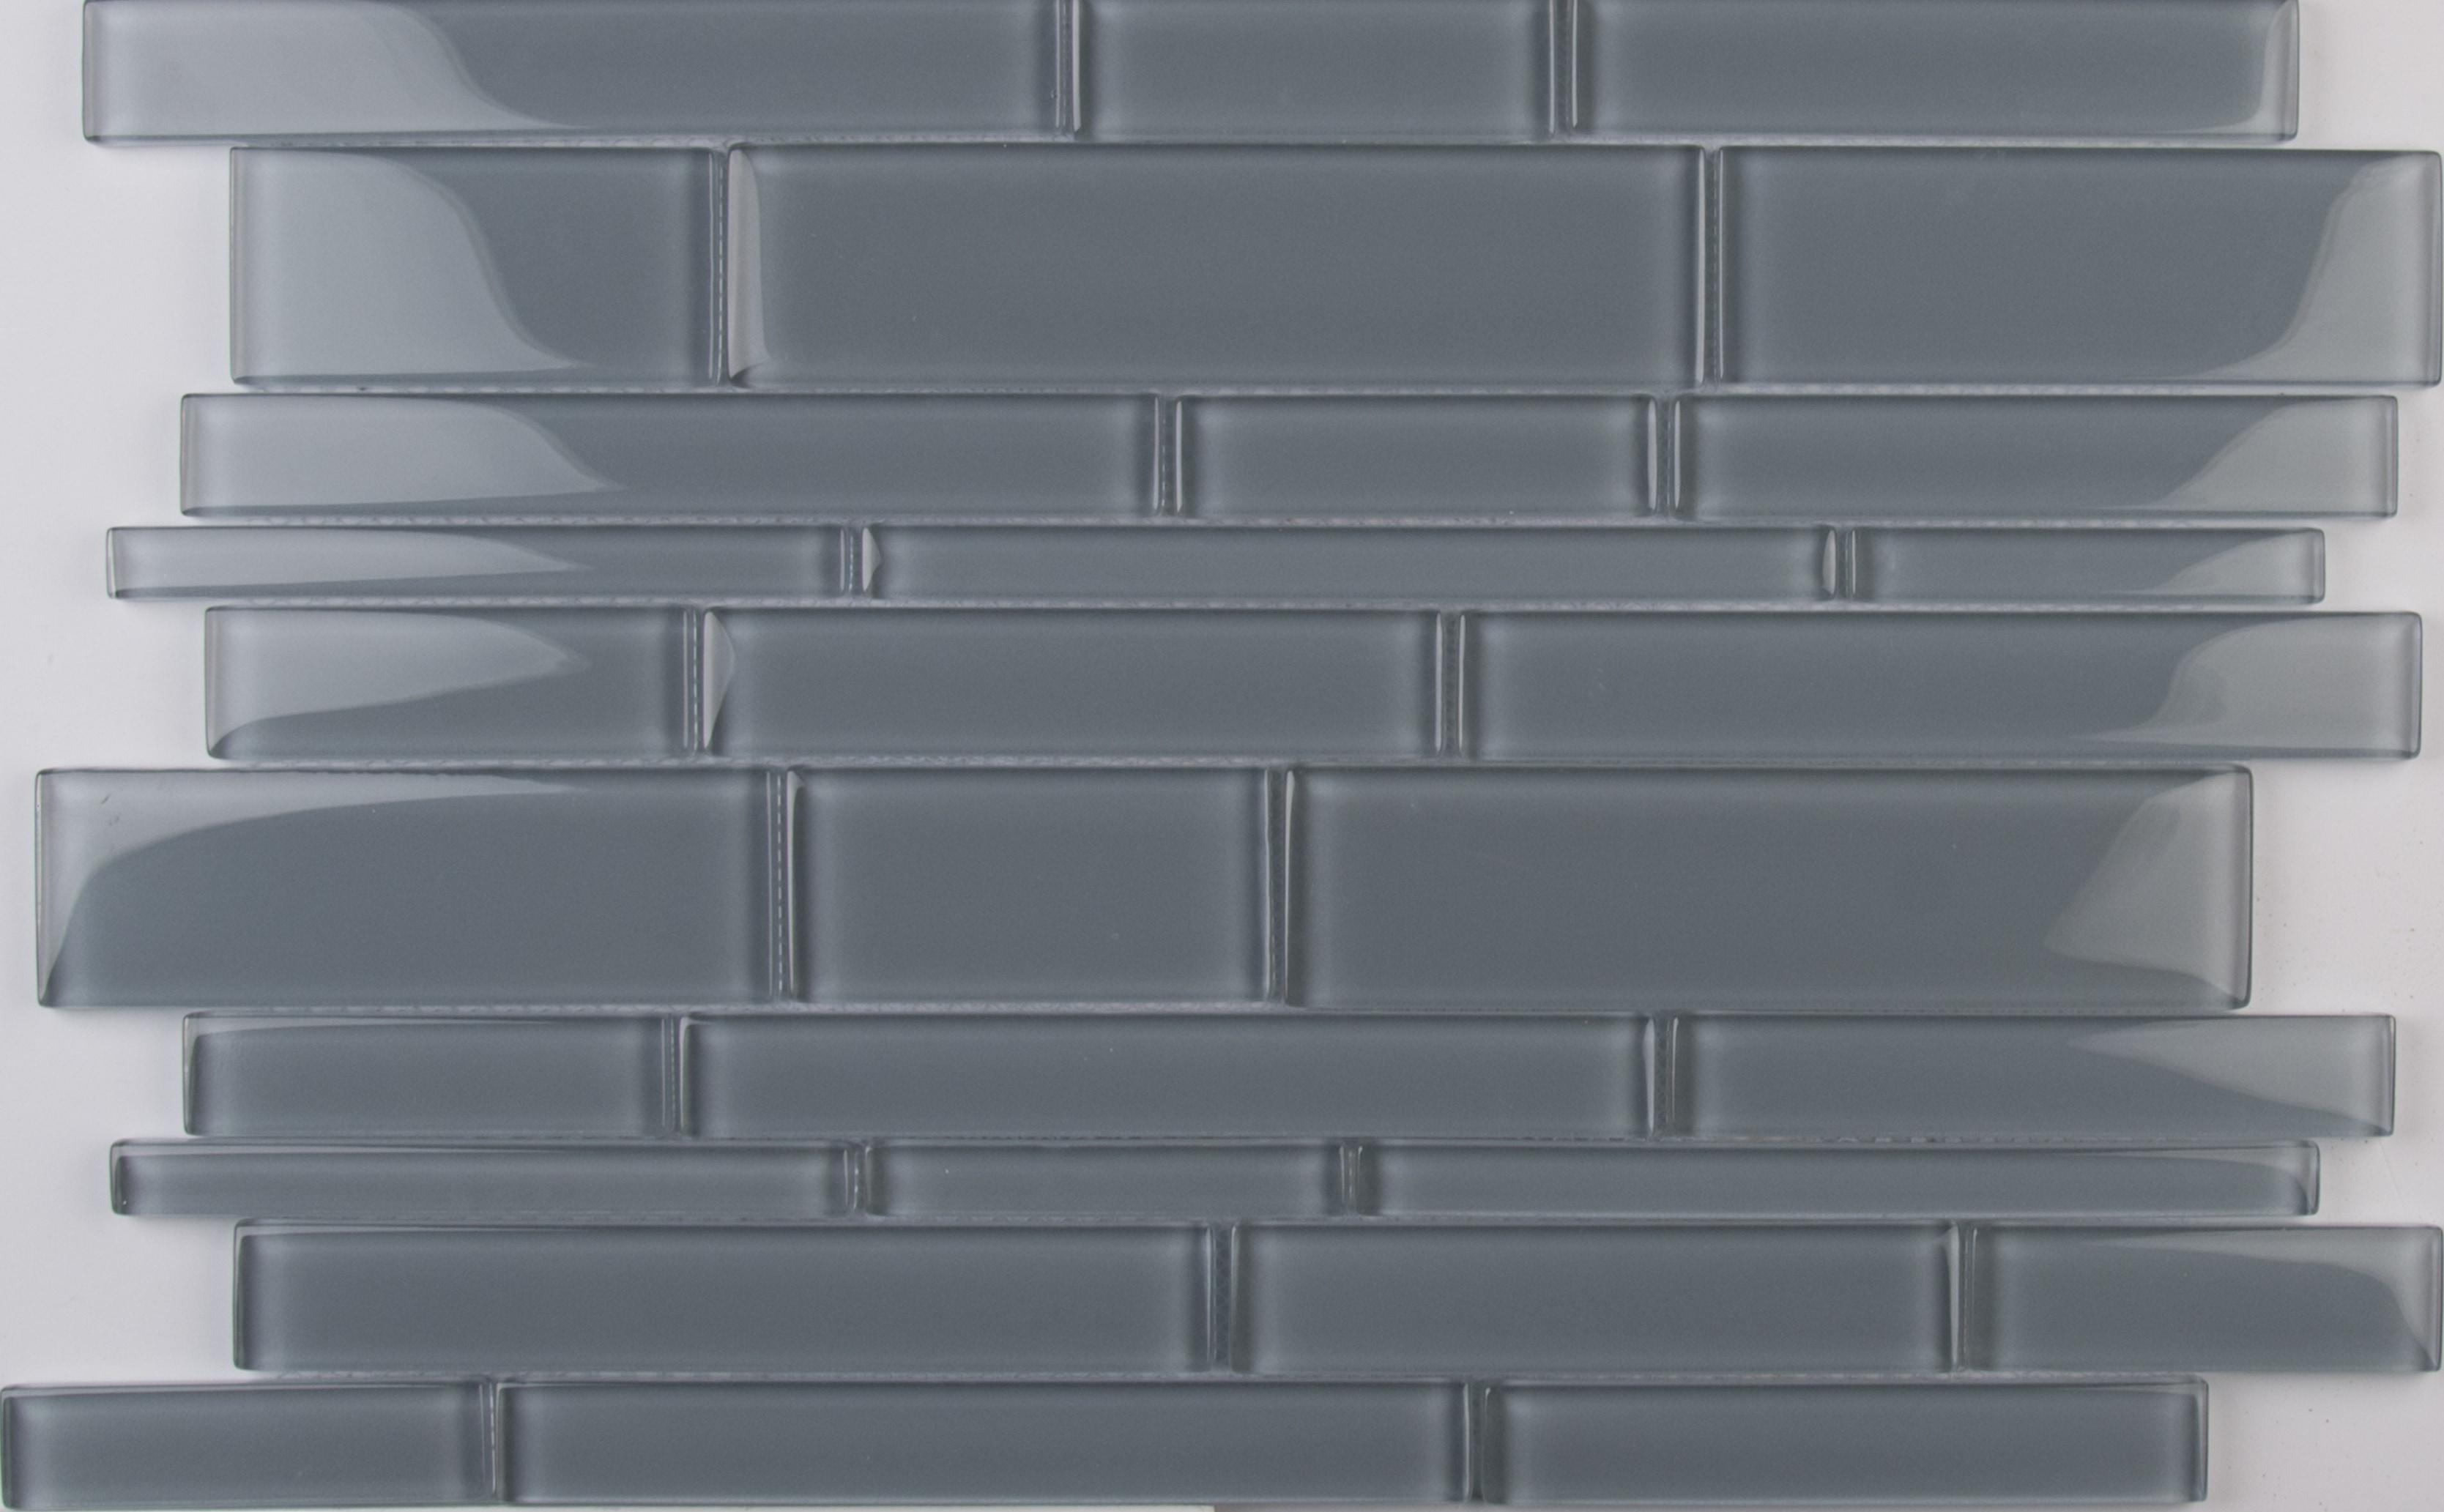 Pebble Interlocking 8mm / Pattern / Glossy Glass Mosaic - Pebble Collection 0